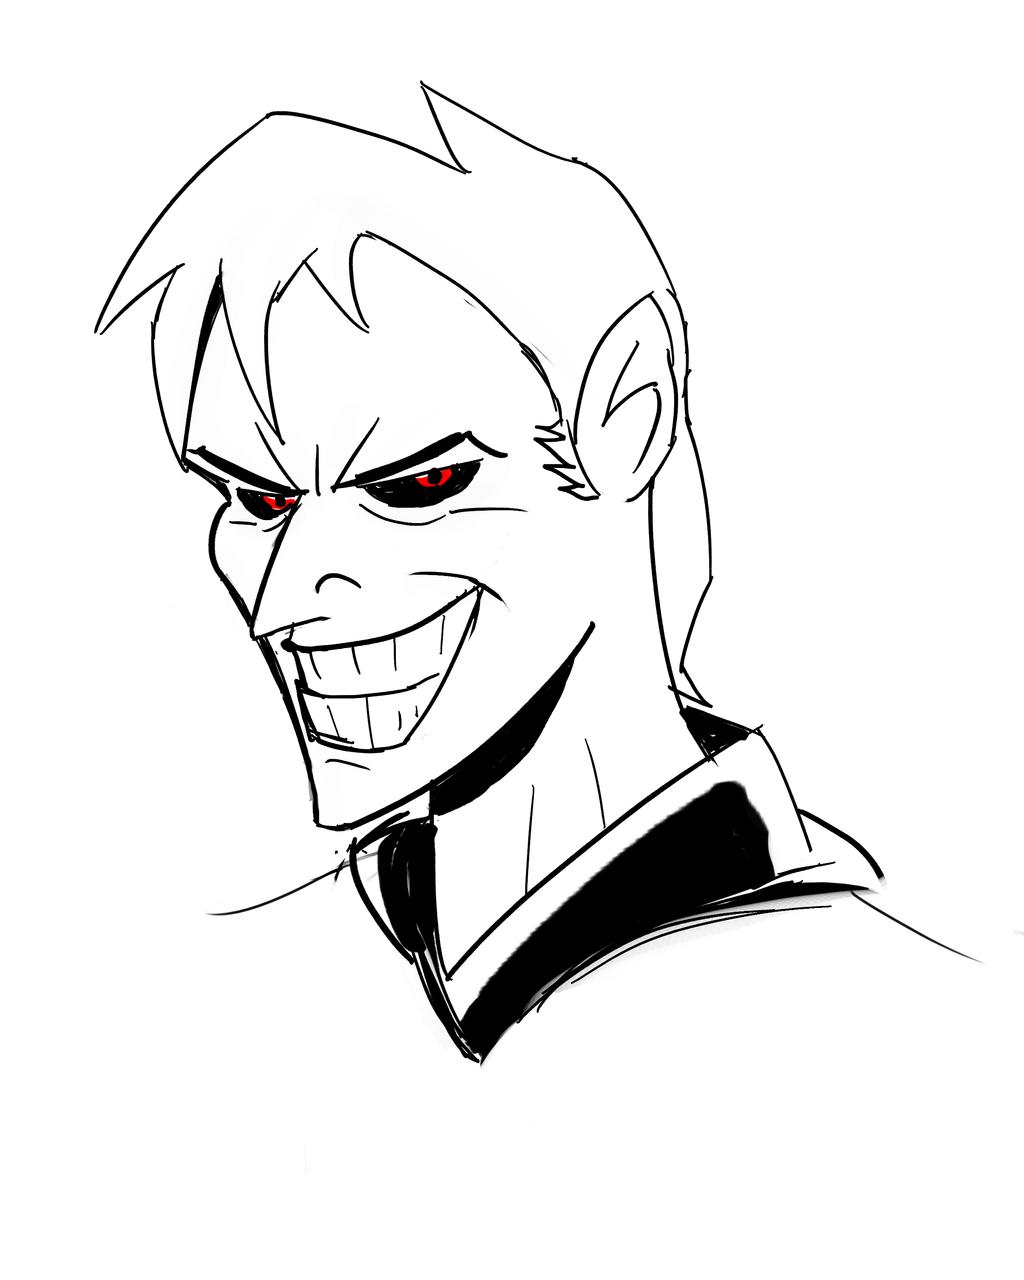 Dark Bruce Timm Style *doodle* by ShadowClawZ